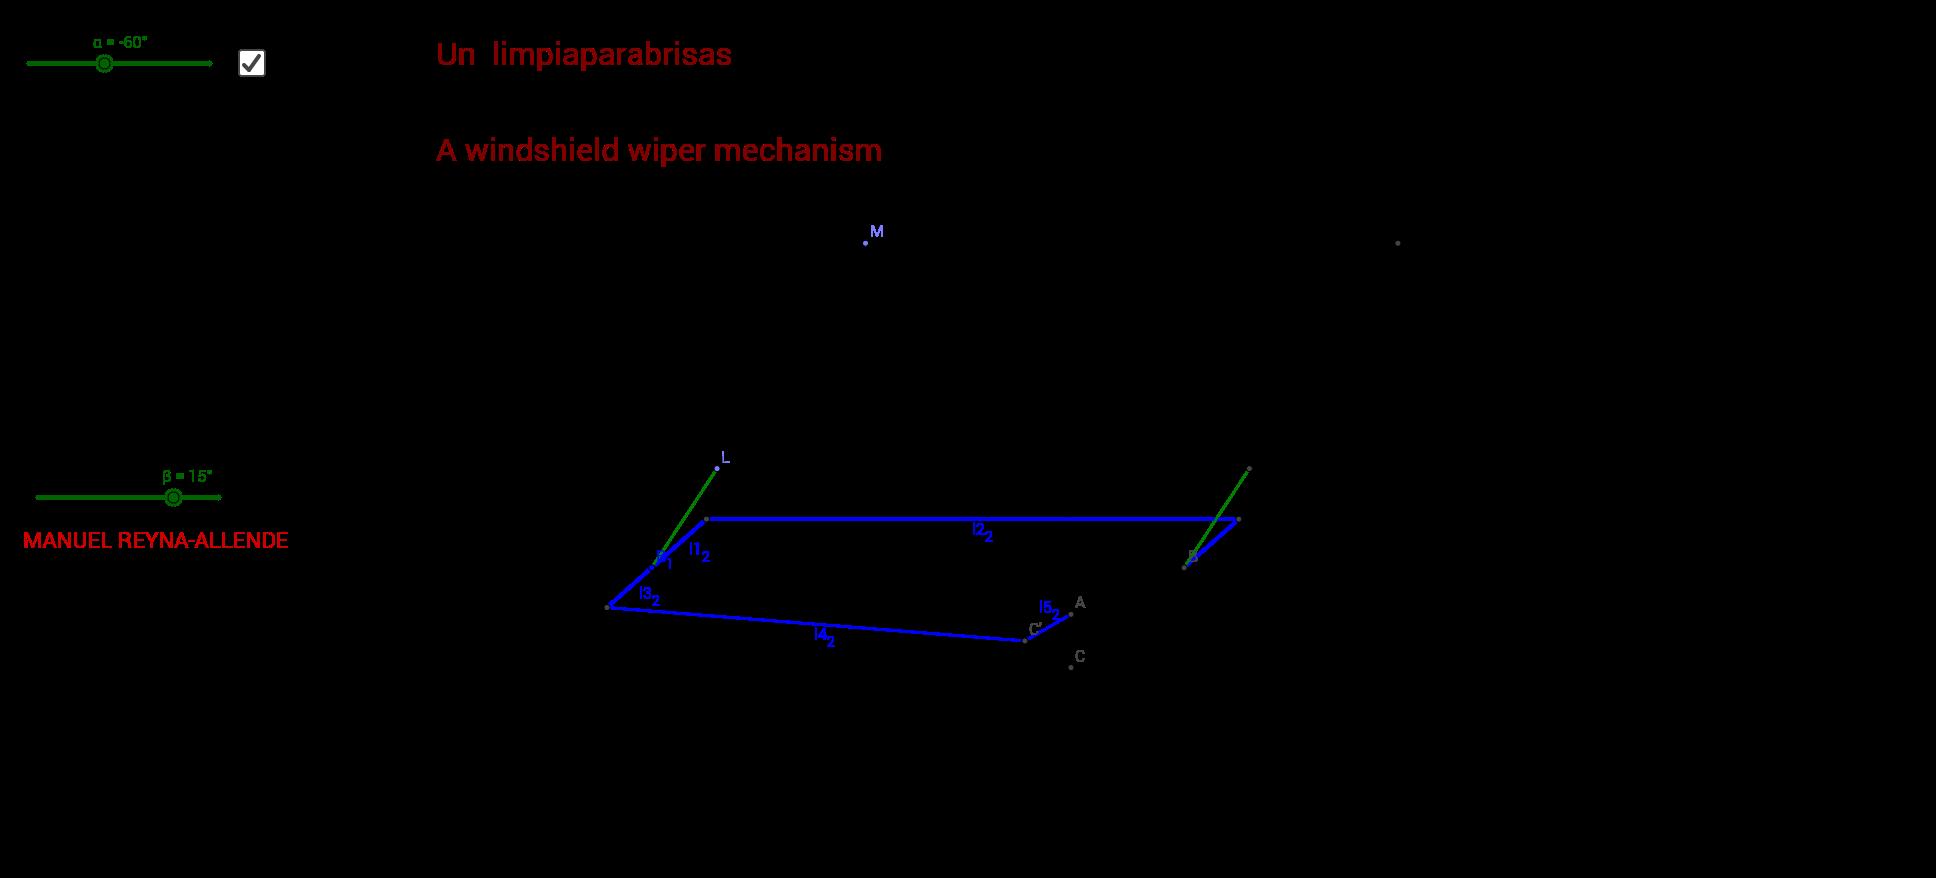 A windshield wiper mechanism ( Un  limpiaparabrisas)